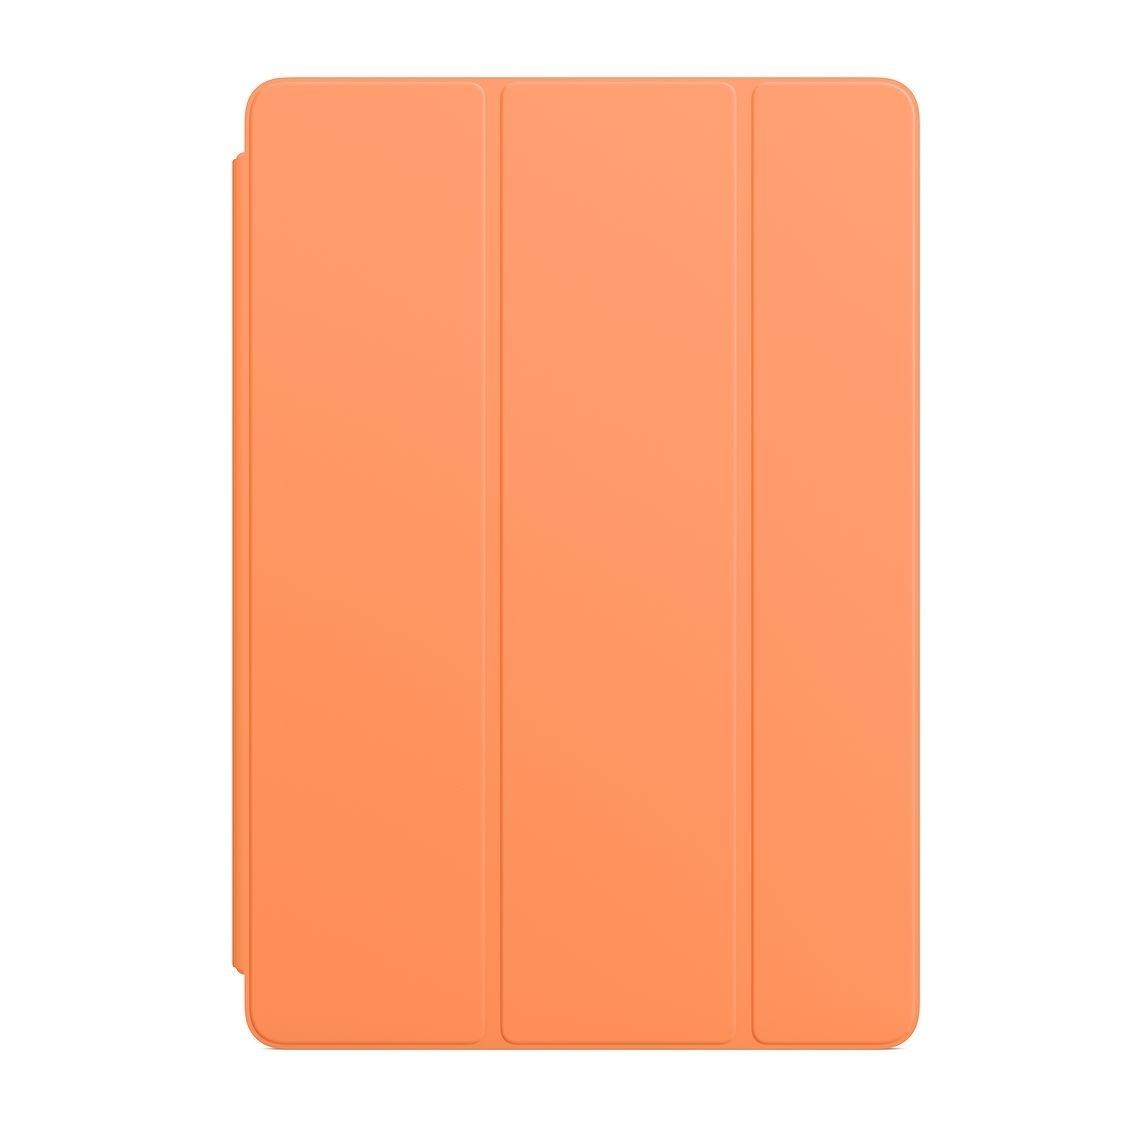 Apple обновила «умные чехлы» для iPad Air и iPad mini 51